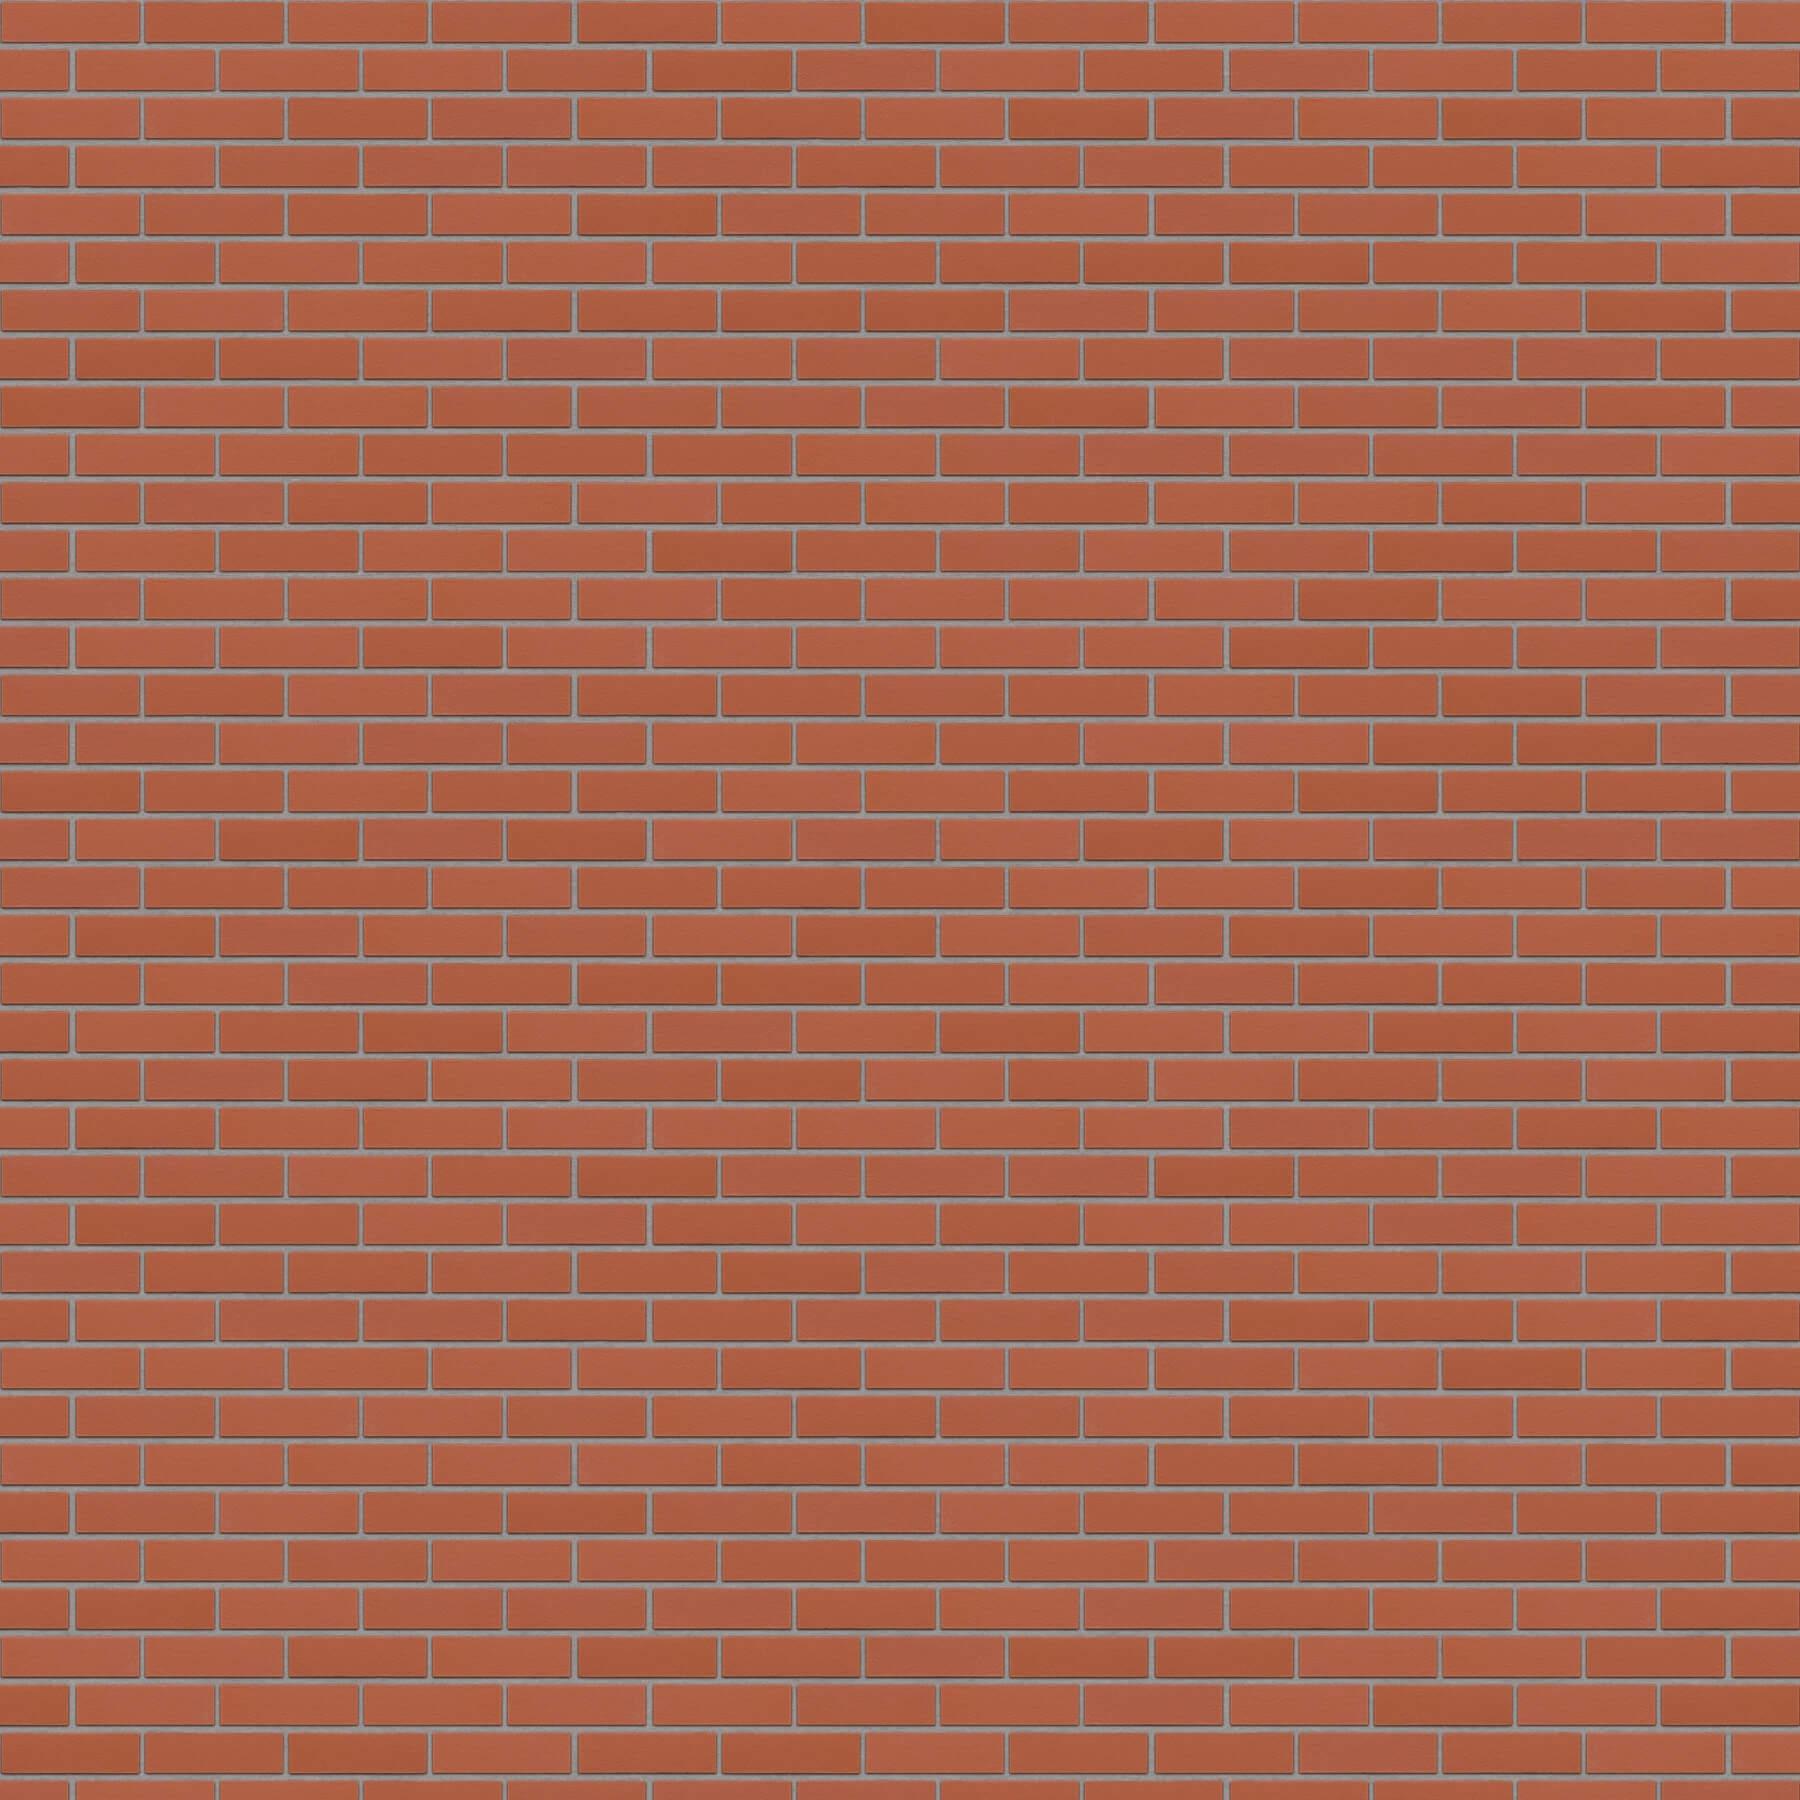 Puna-cigla-FeldHaus-Klinker-brick-house-nf-k-400-SIva Fuga